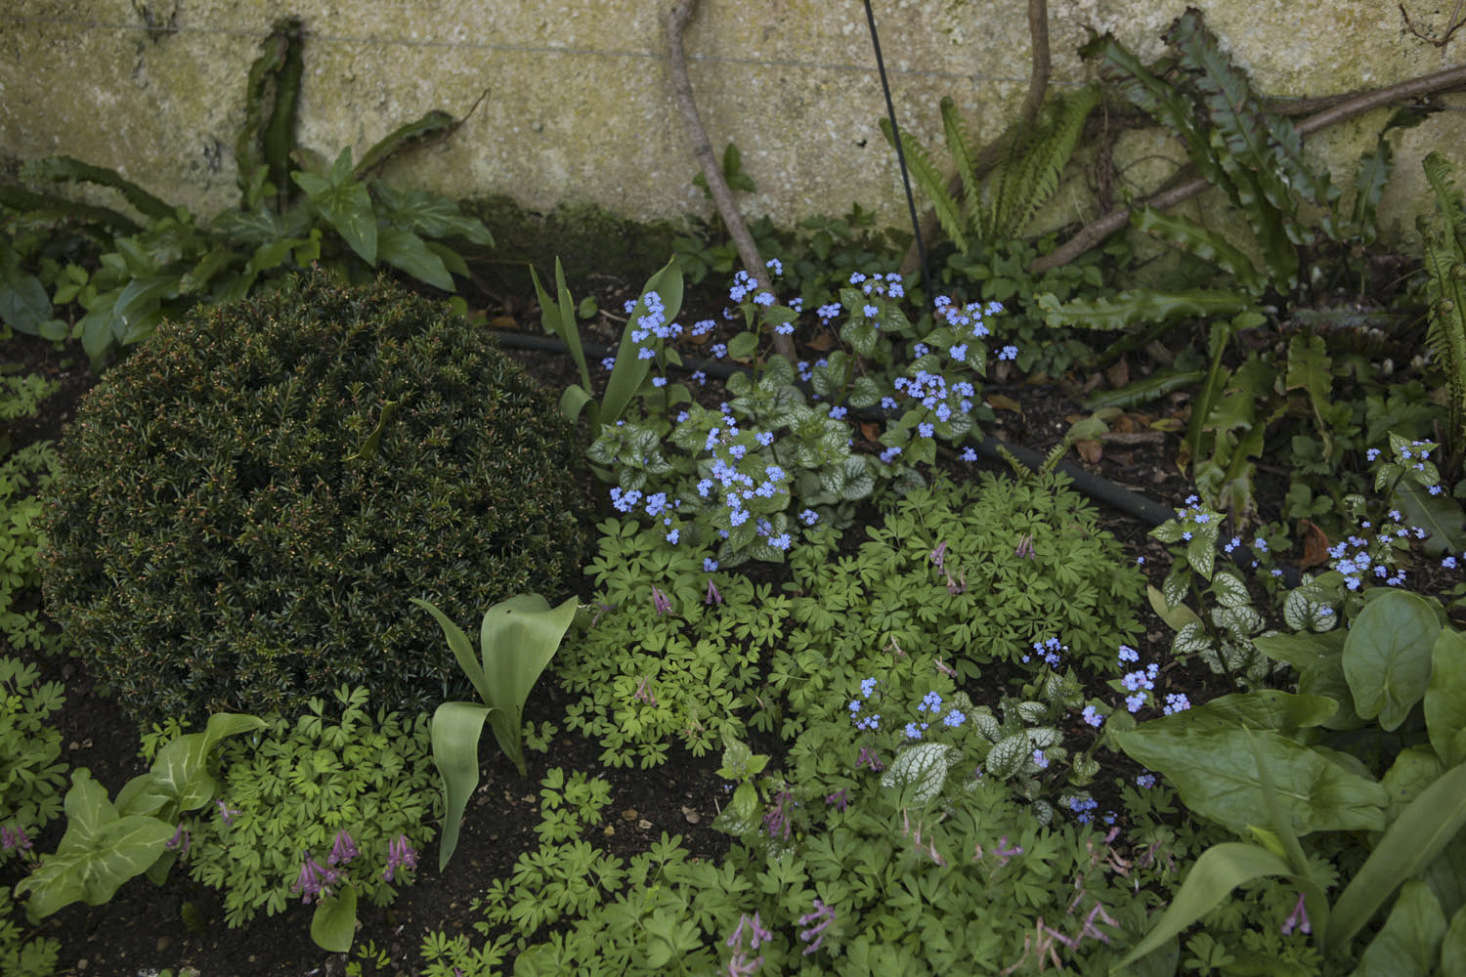 Mauve corydalis and blue brunnera make a spring ground cover.